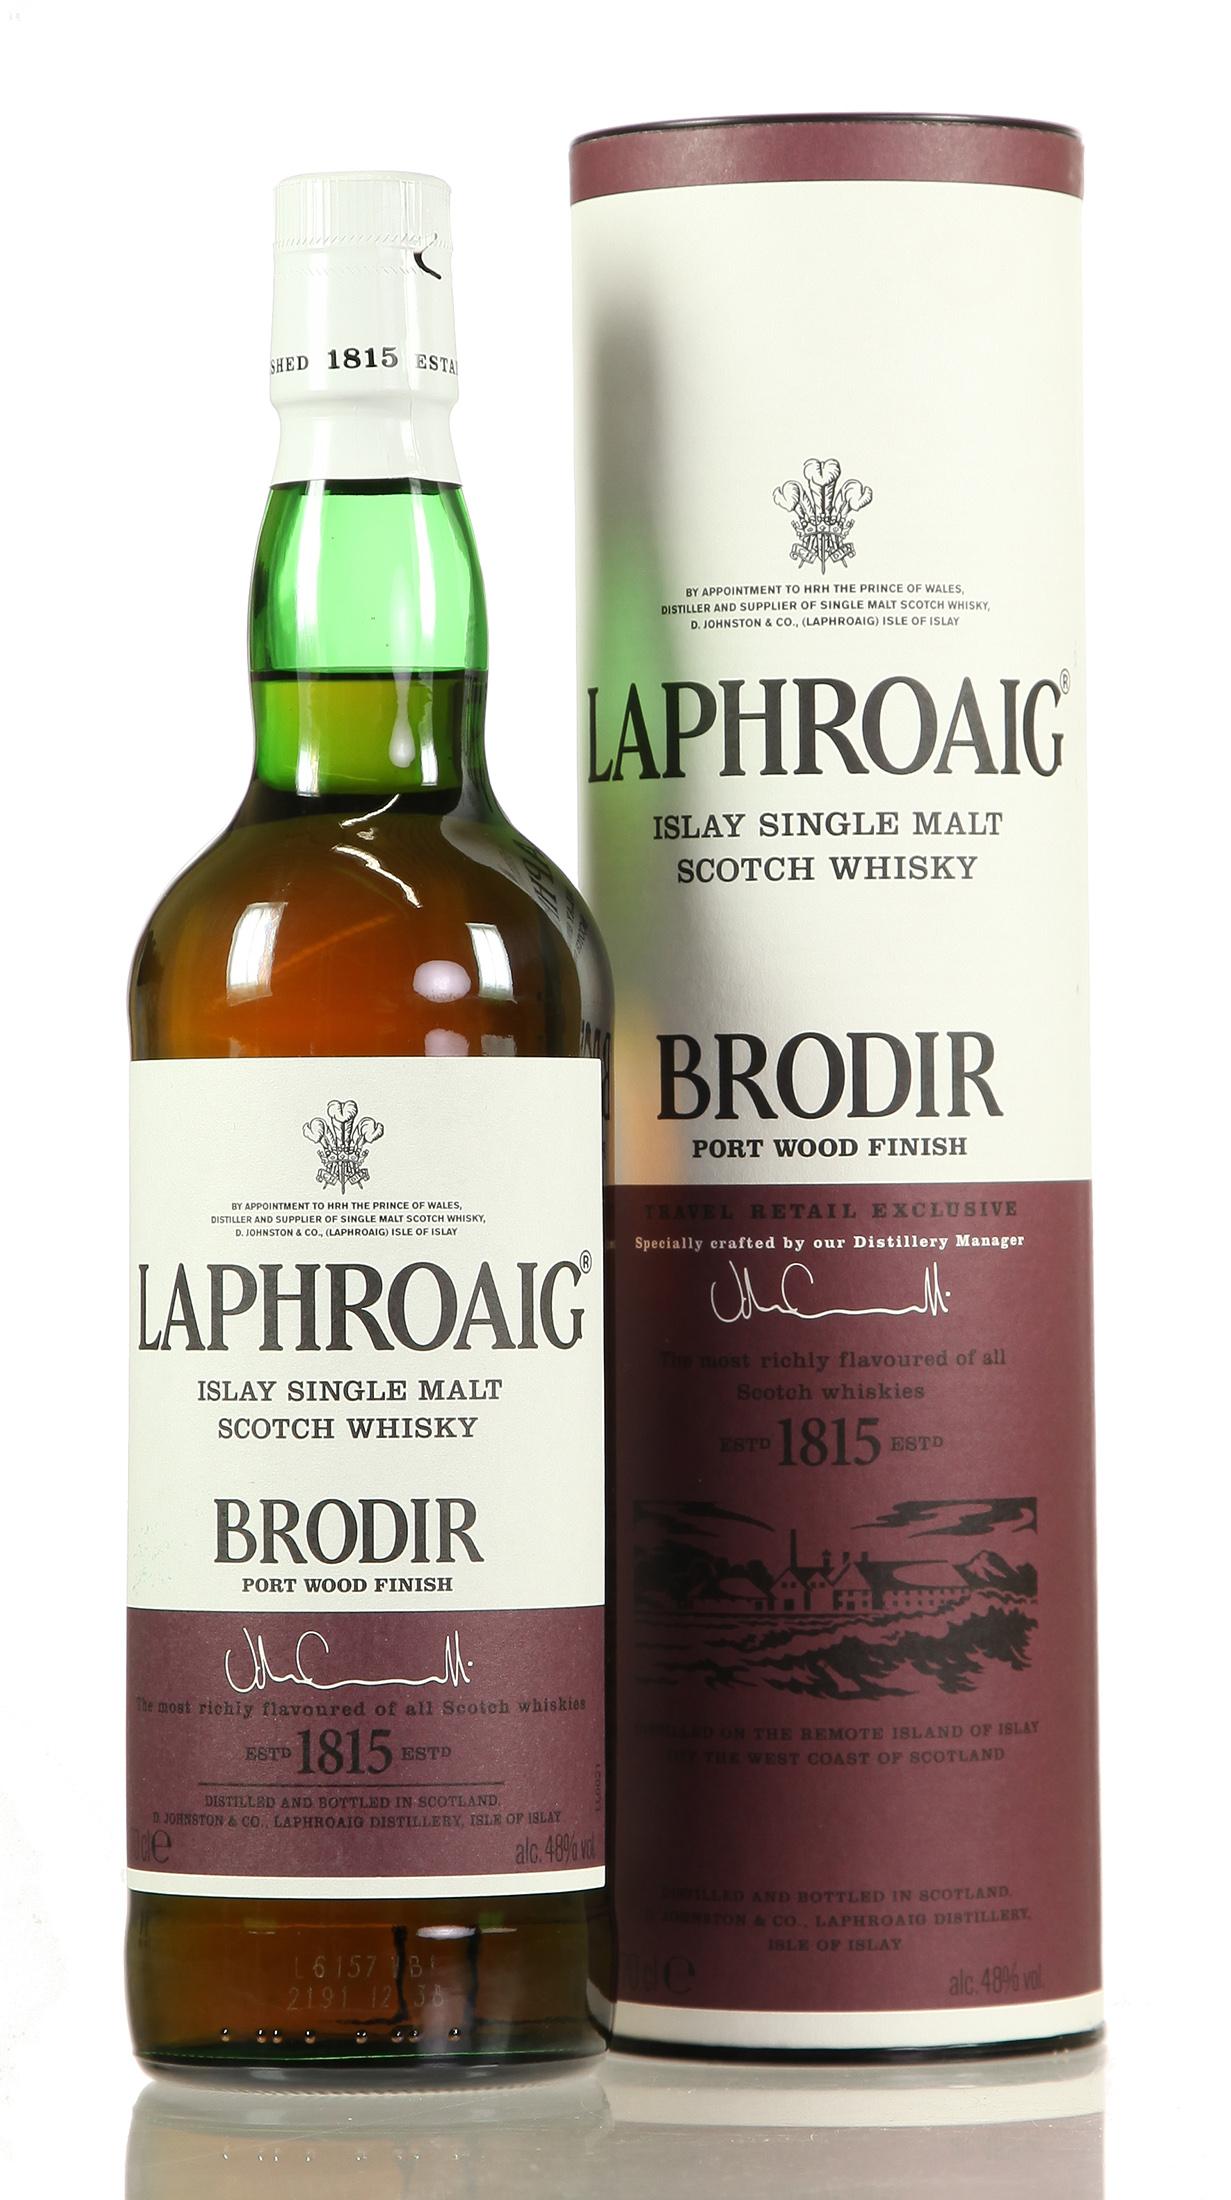 Laphroaig Brodir Port Wood Finished